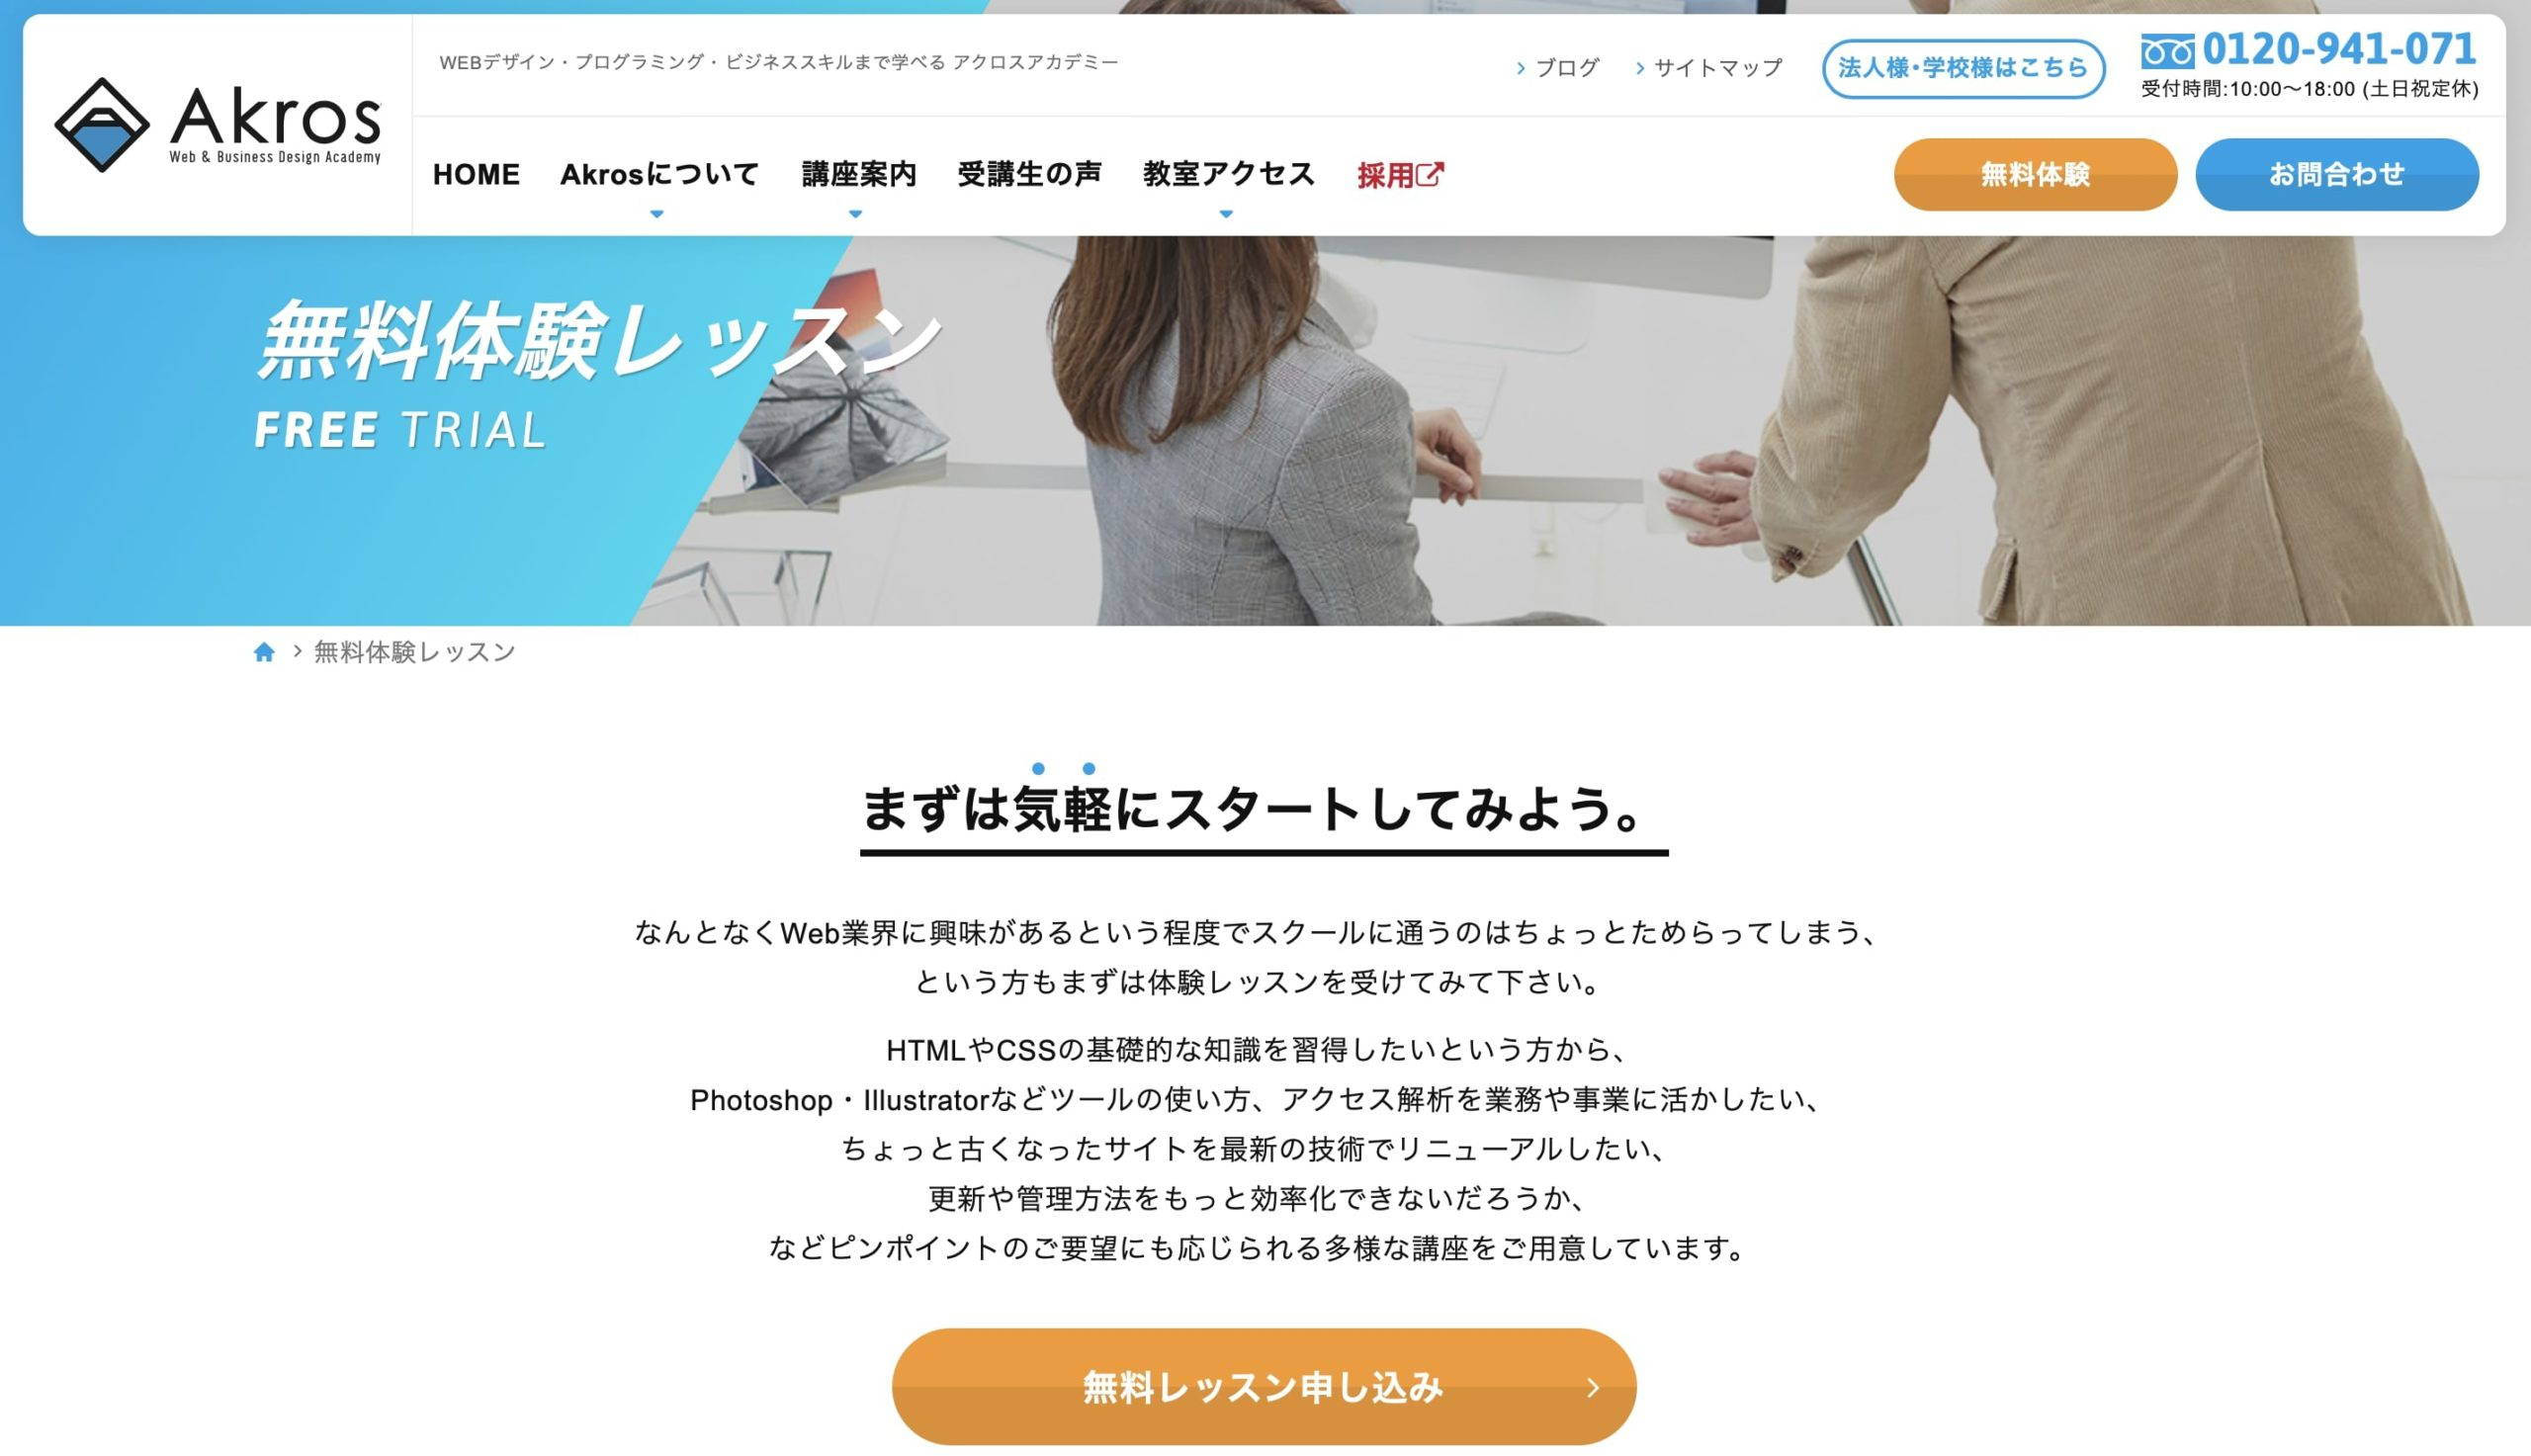 AkrosAcademyの無料体験応募フォームNO1